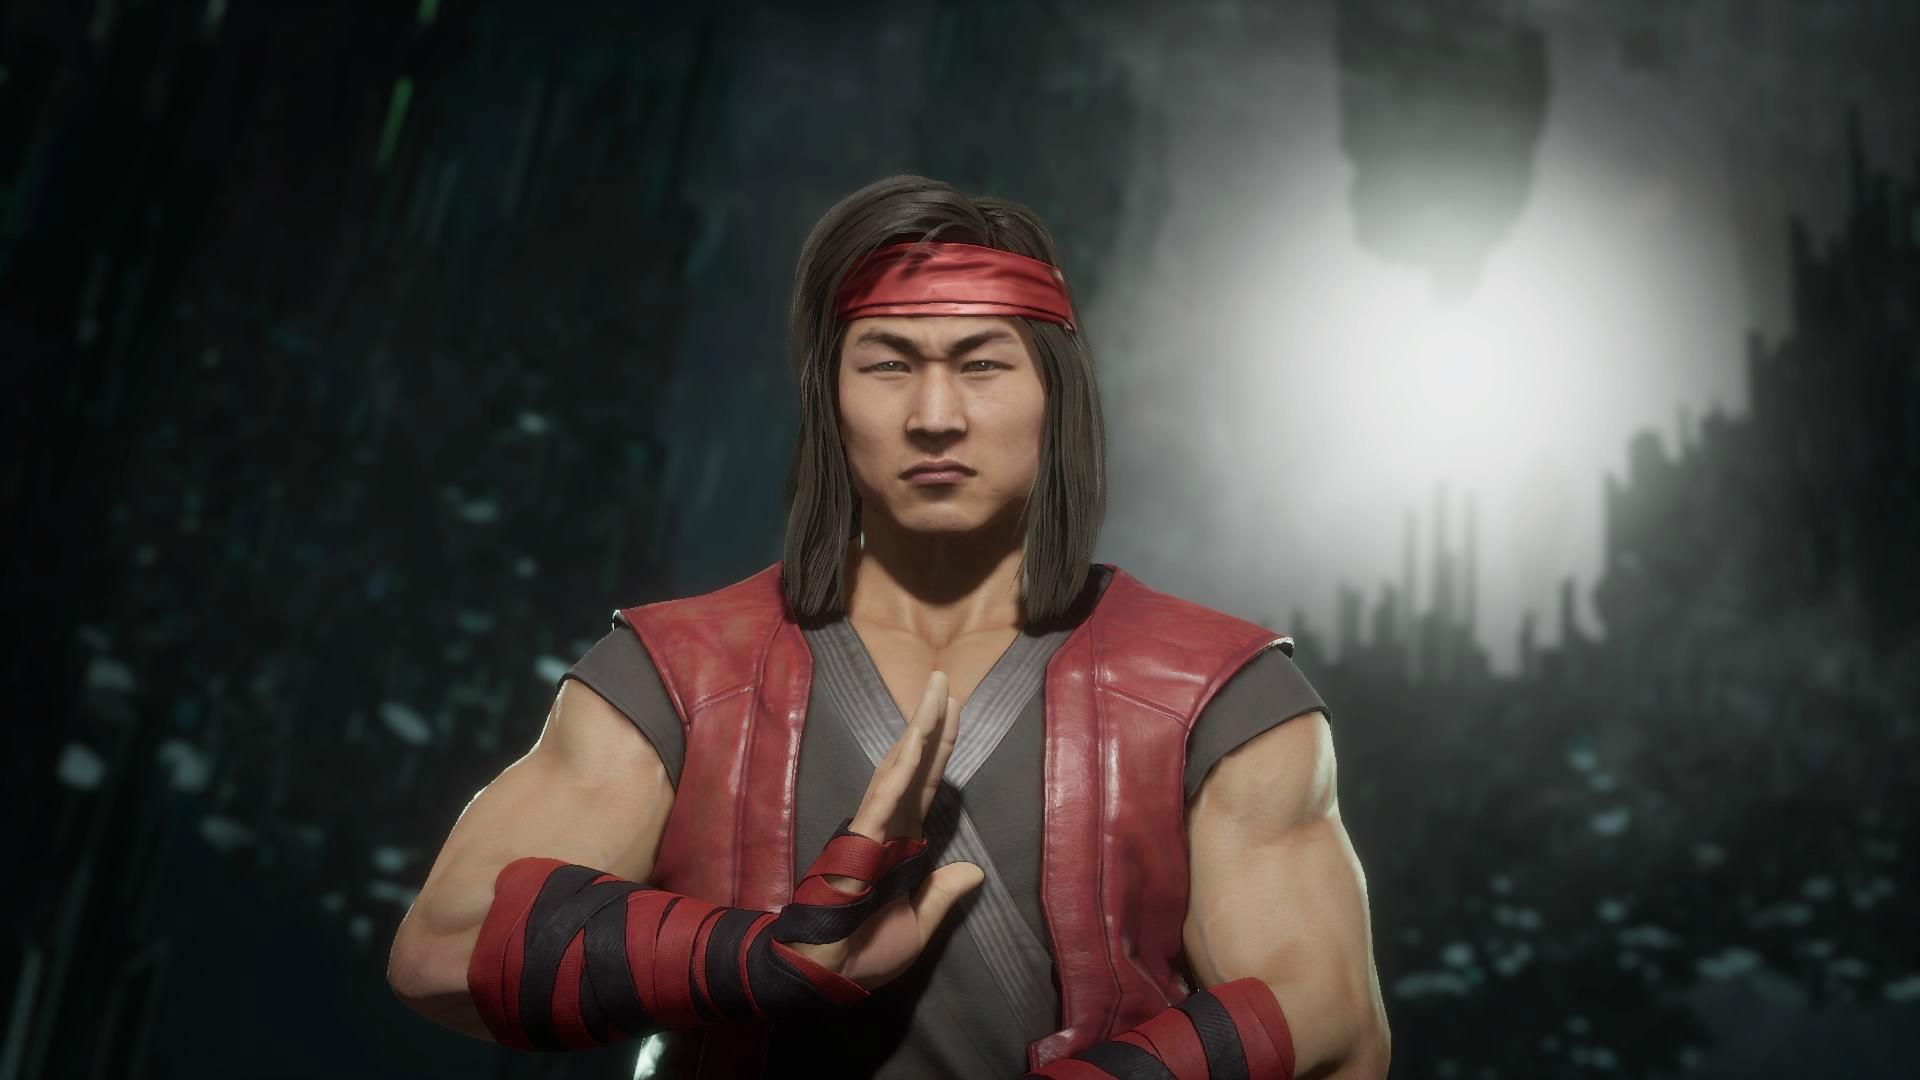 Liu Kang Mortal Kombat 11 Edit By Ryukanglivesagain On Deviantart